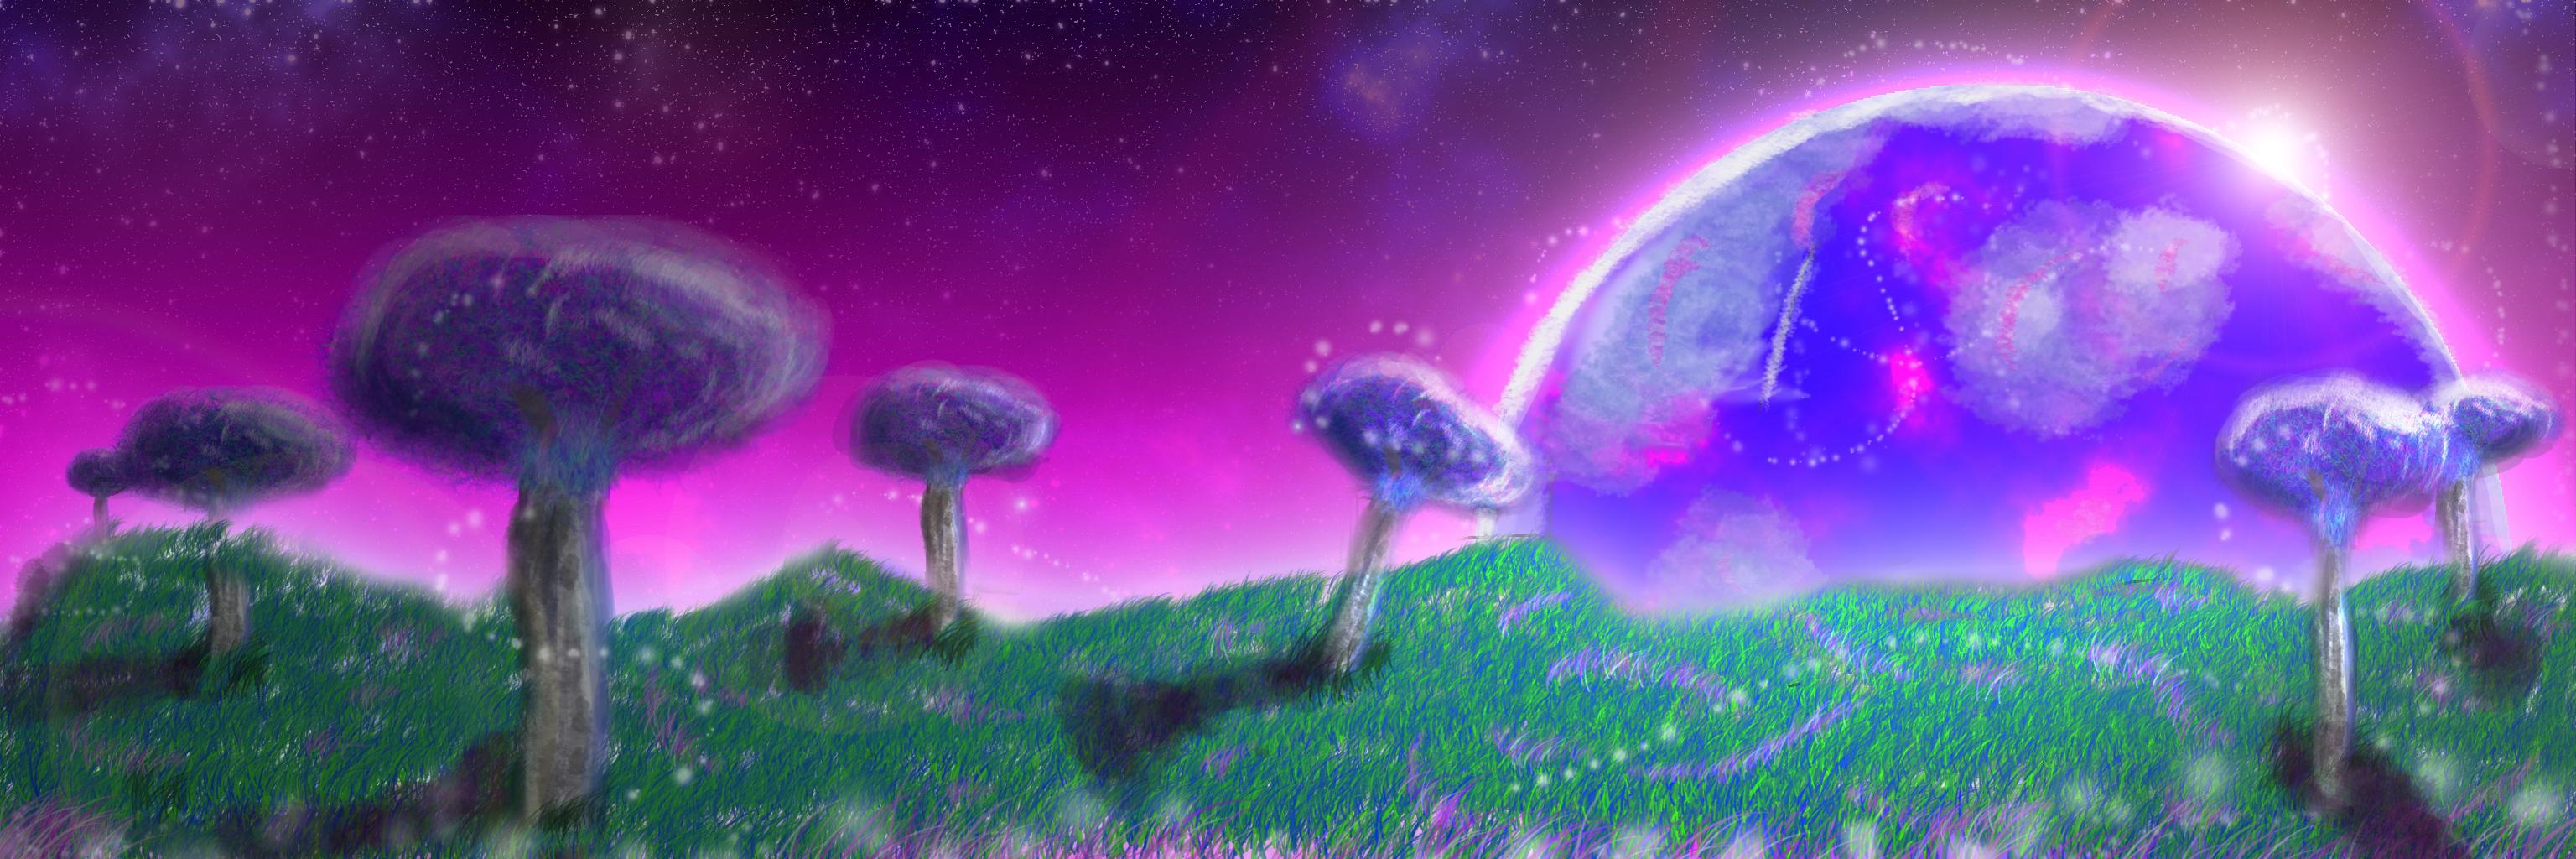 Fairy Field